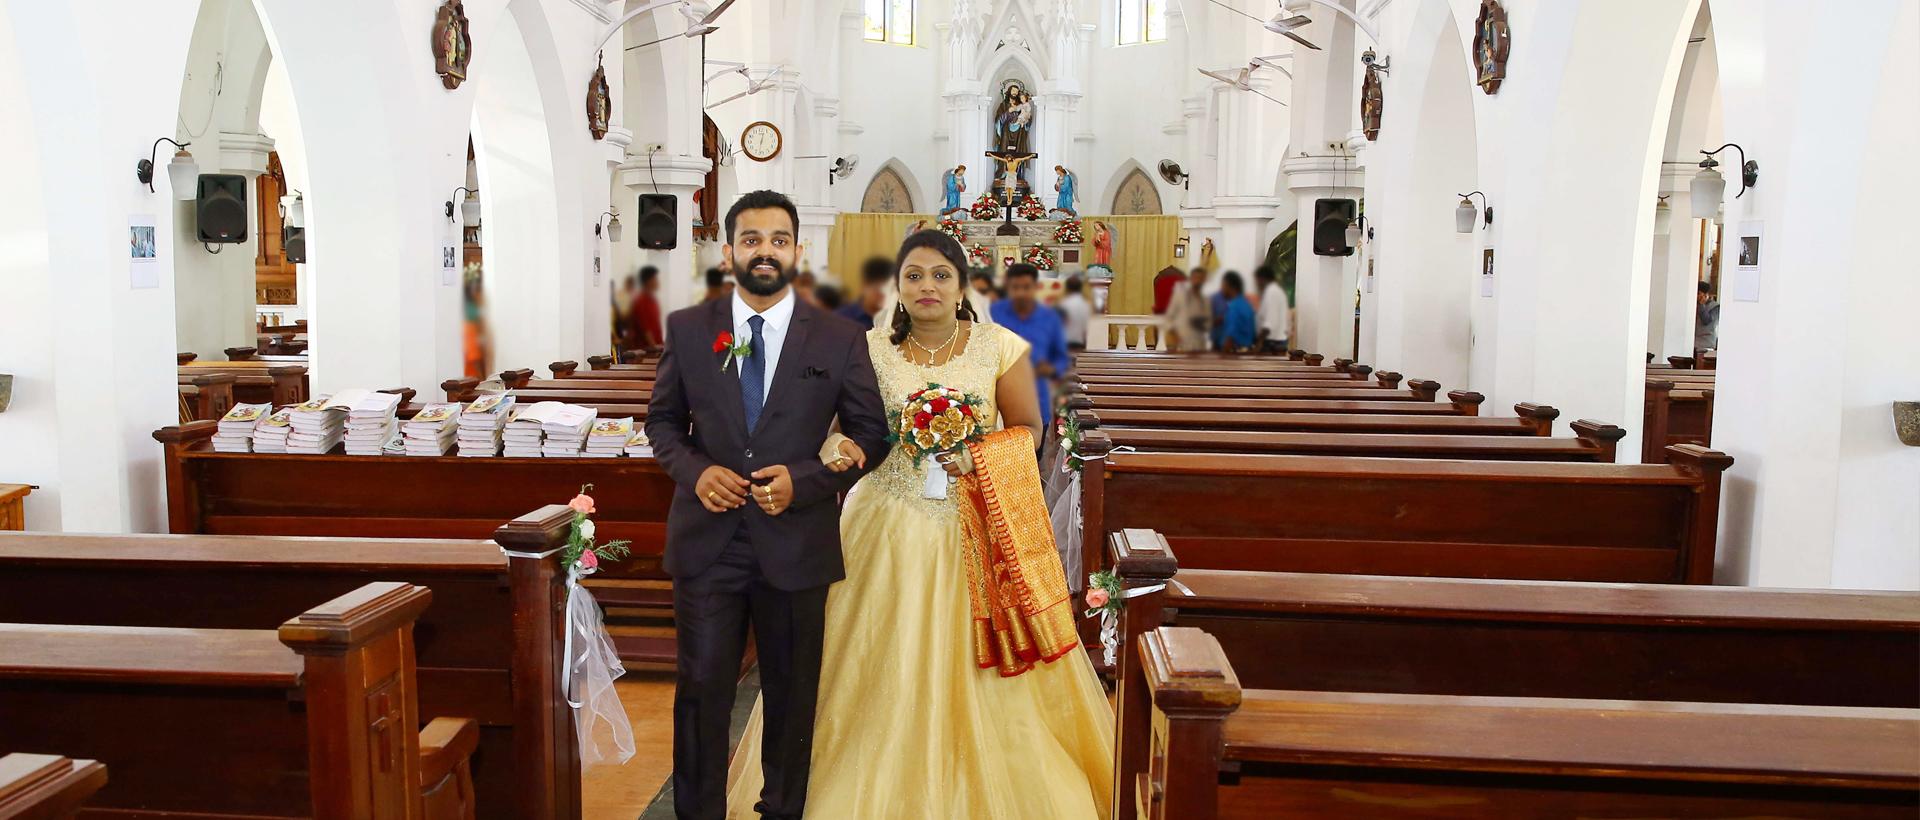 site de matrimoniale org